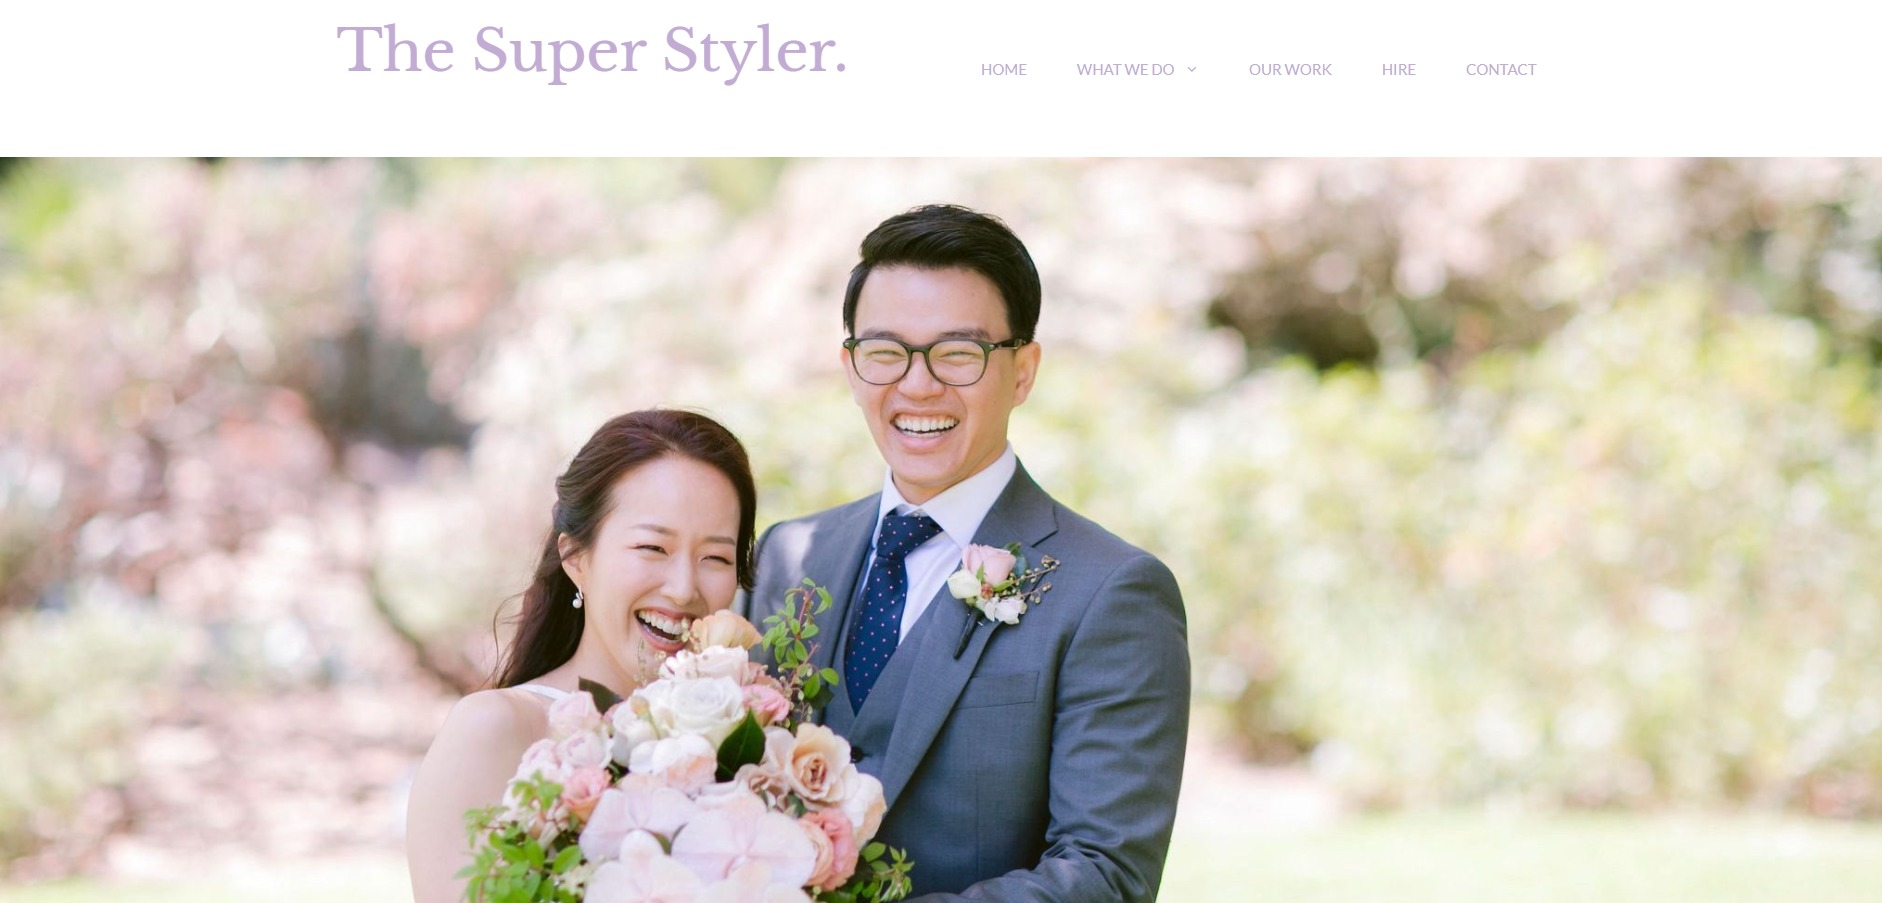 The Super Styler